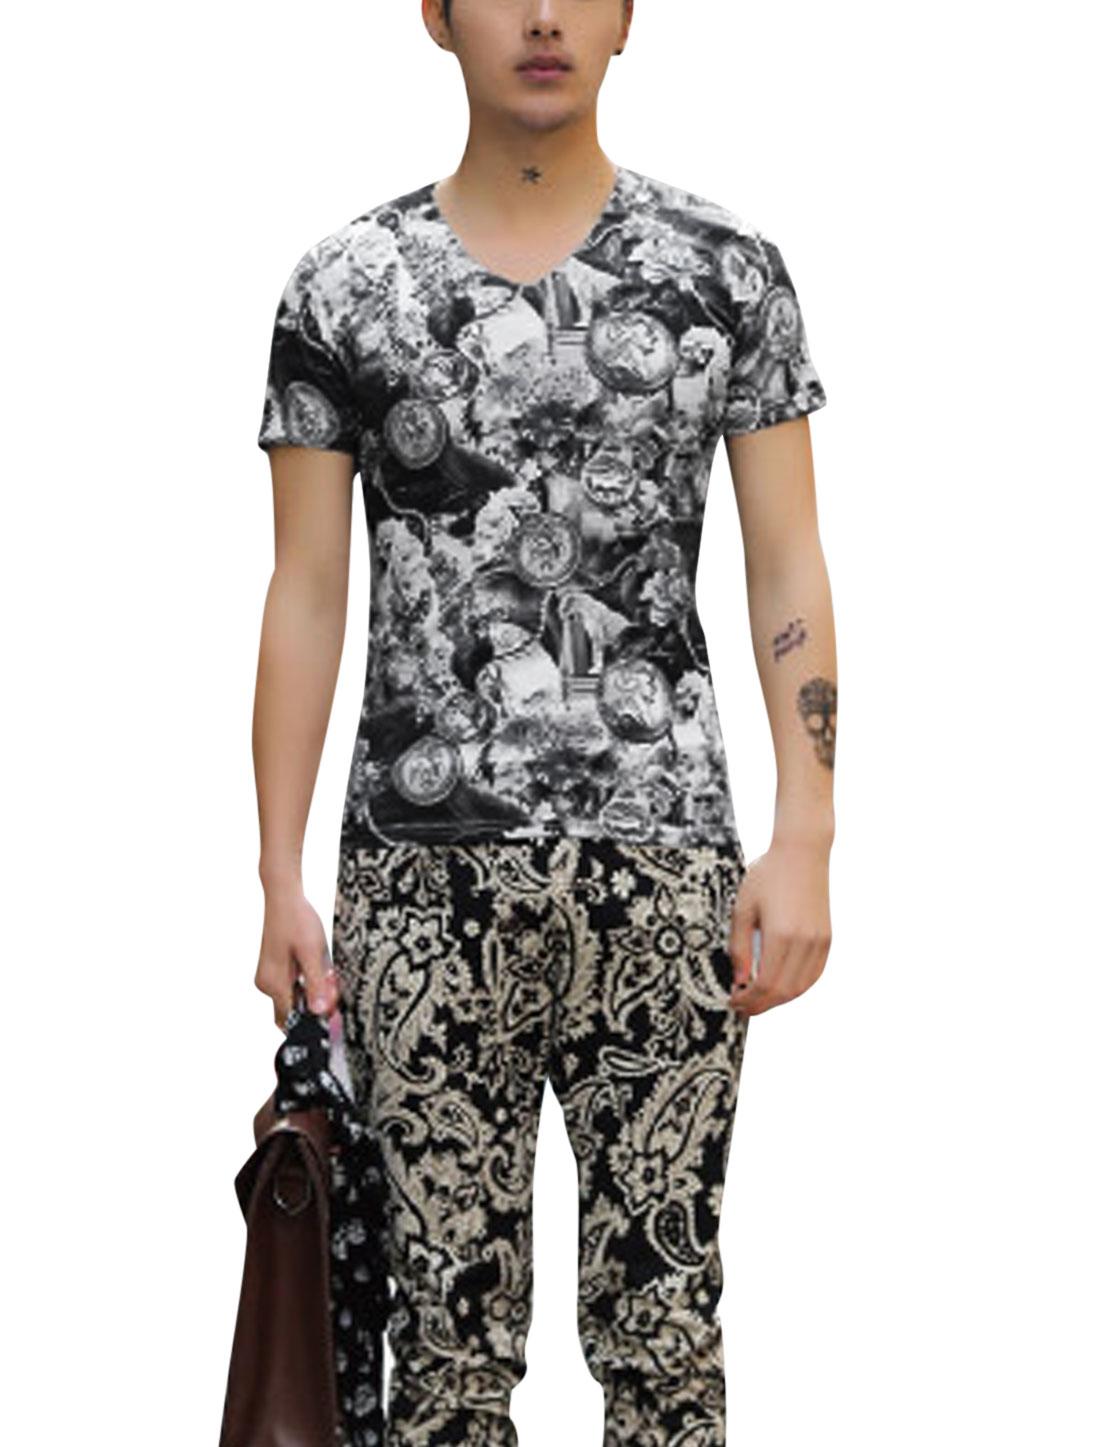 Short Sleeve Flower Pattern Summer Fit T Shirt for Man Black M